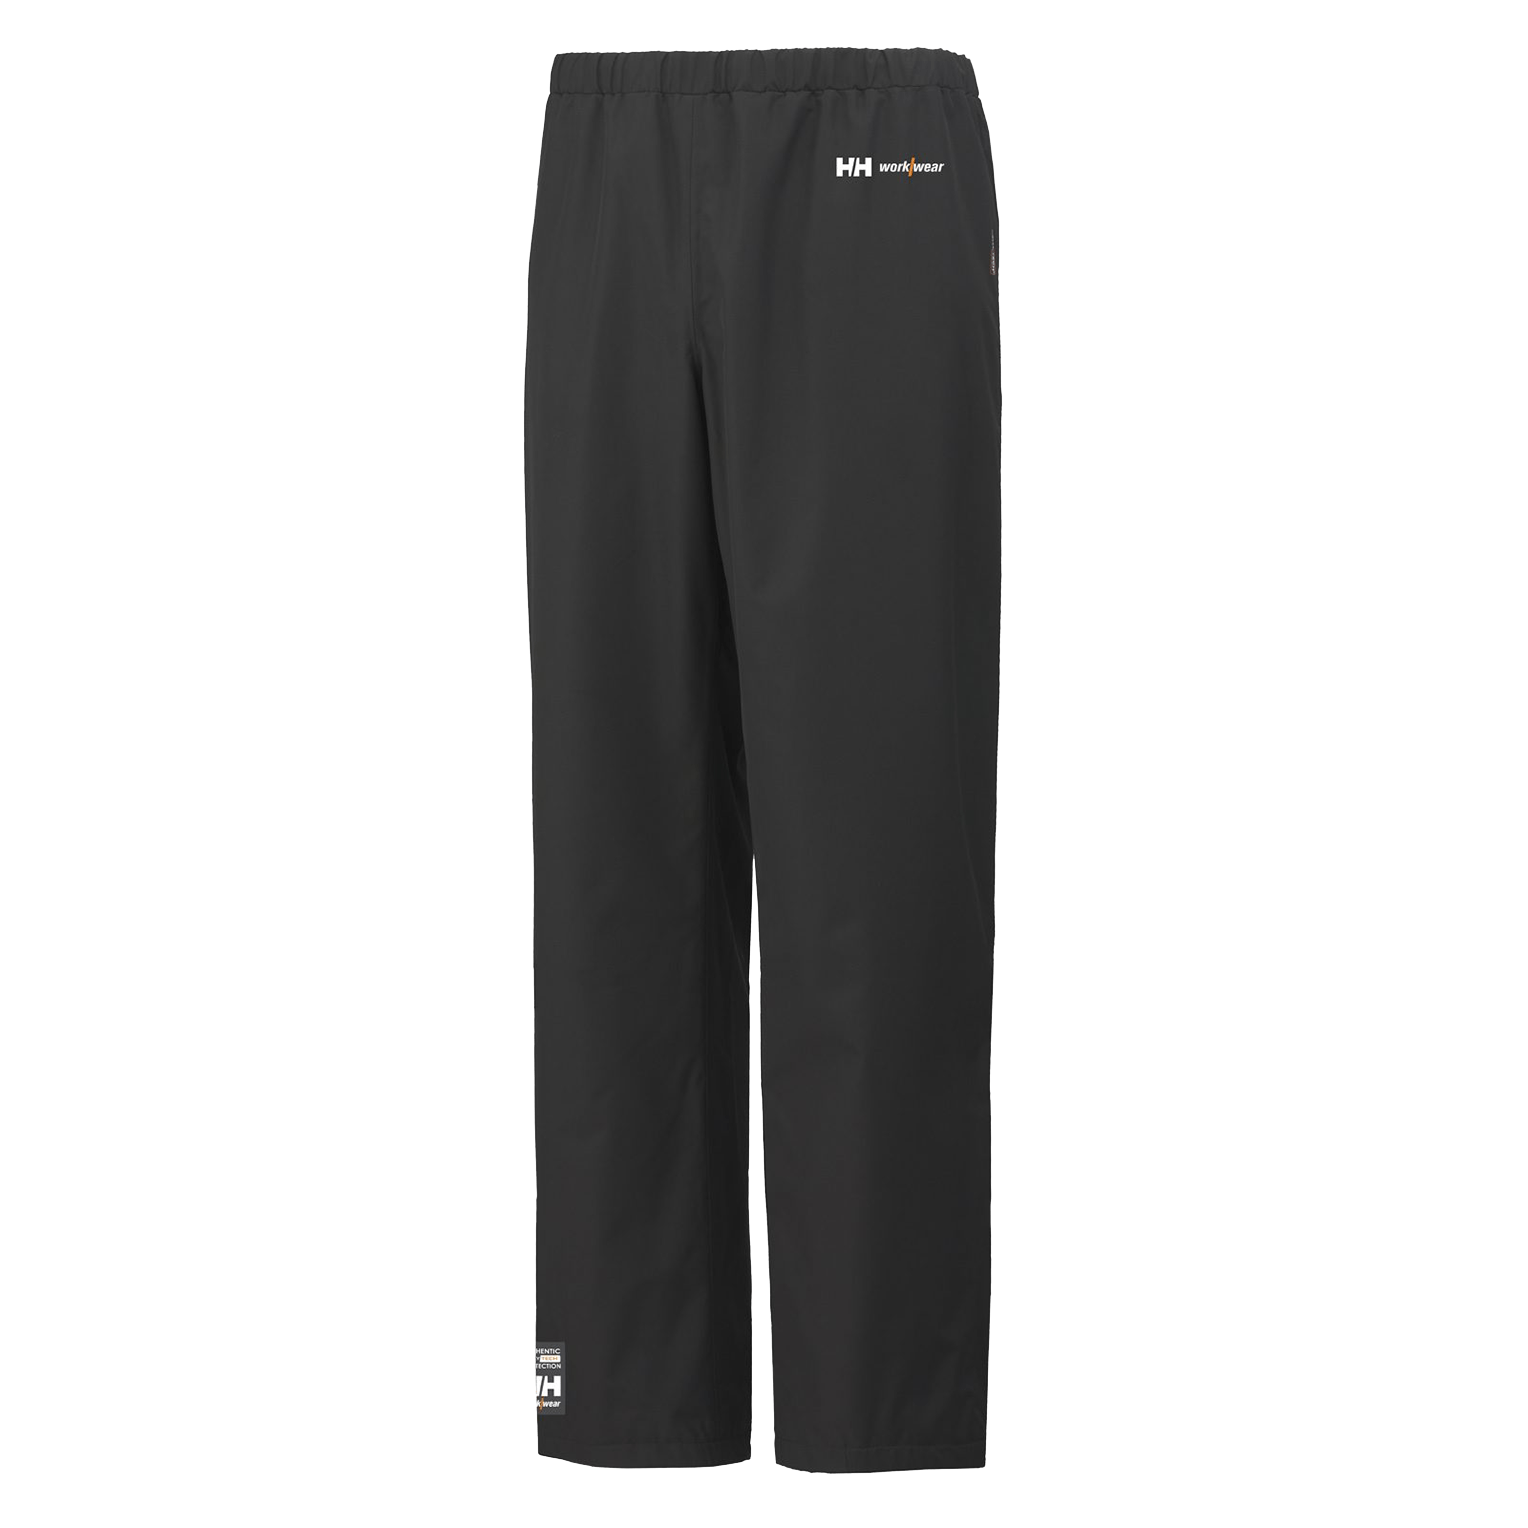 Helly Hansen Mens Gent Pant Waterproof Windproof Workwear Trousers